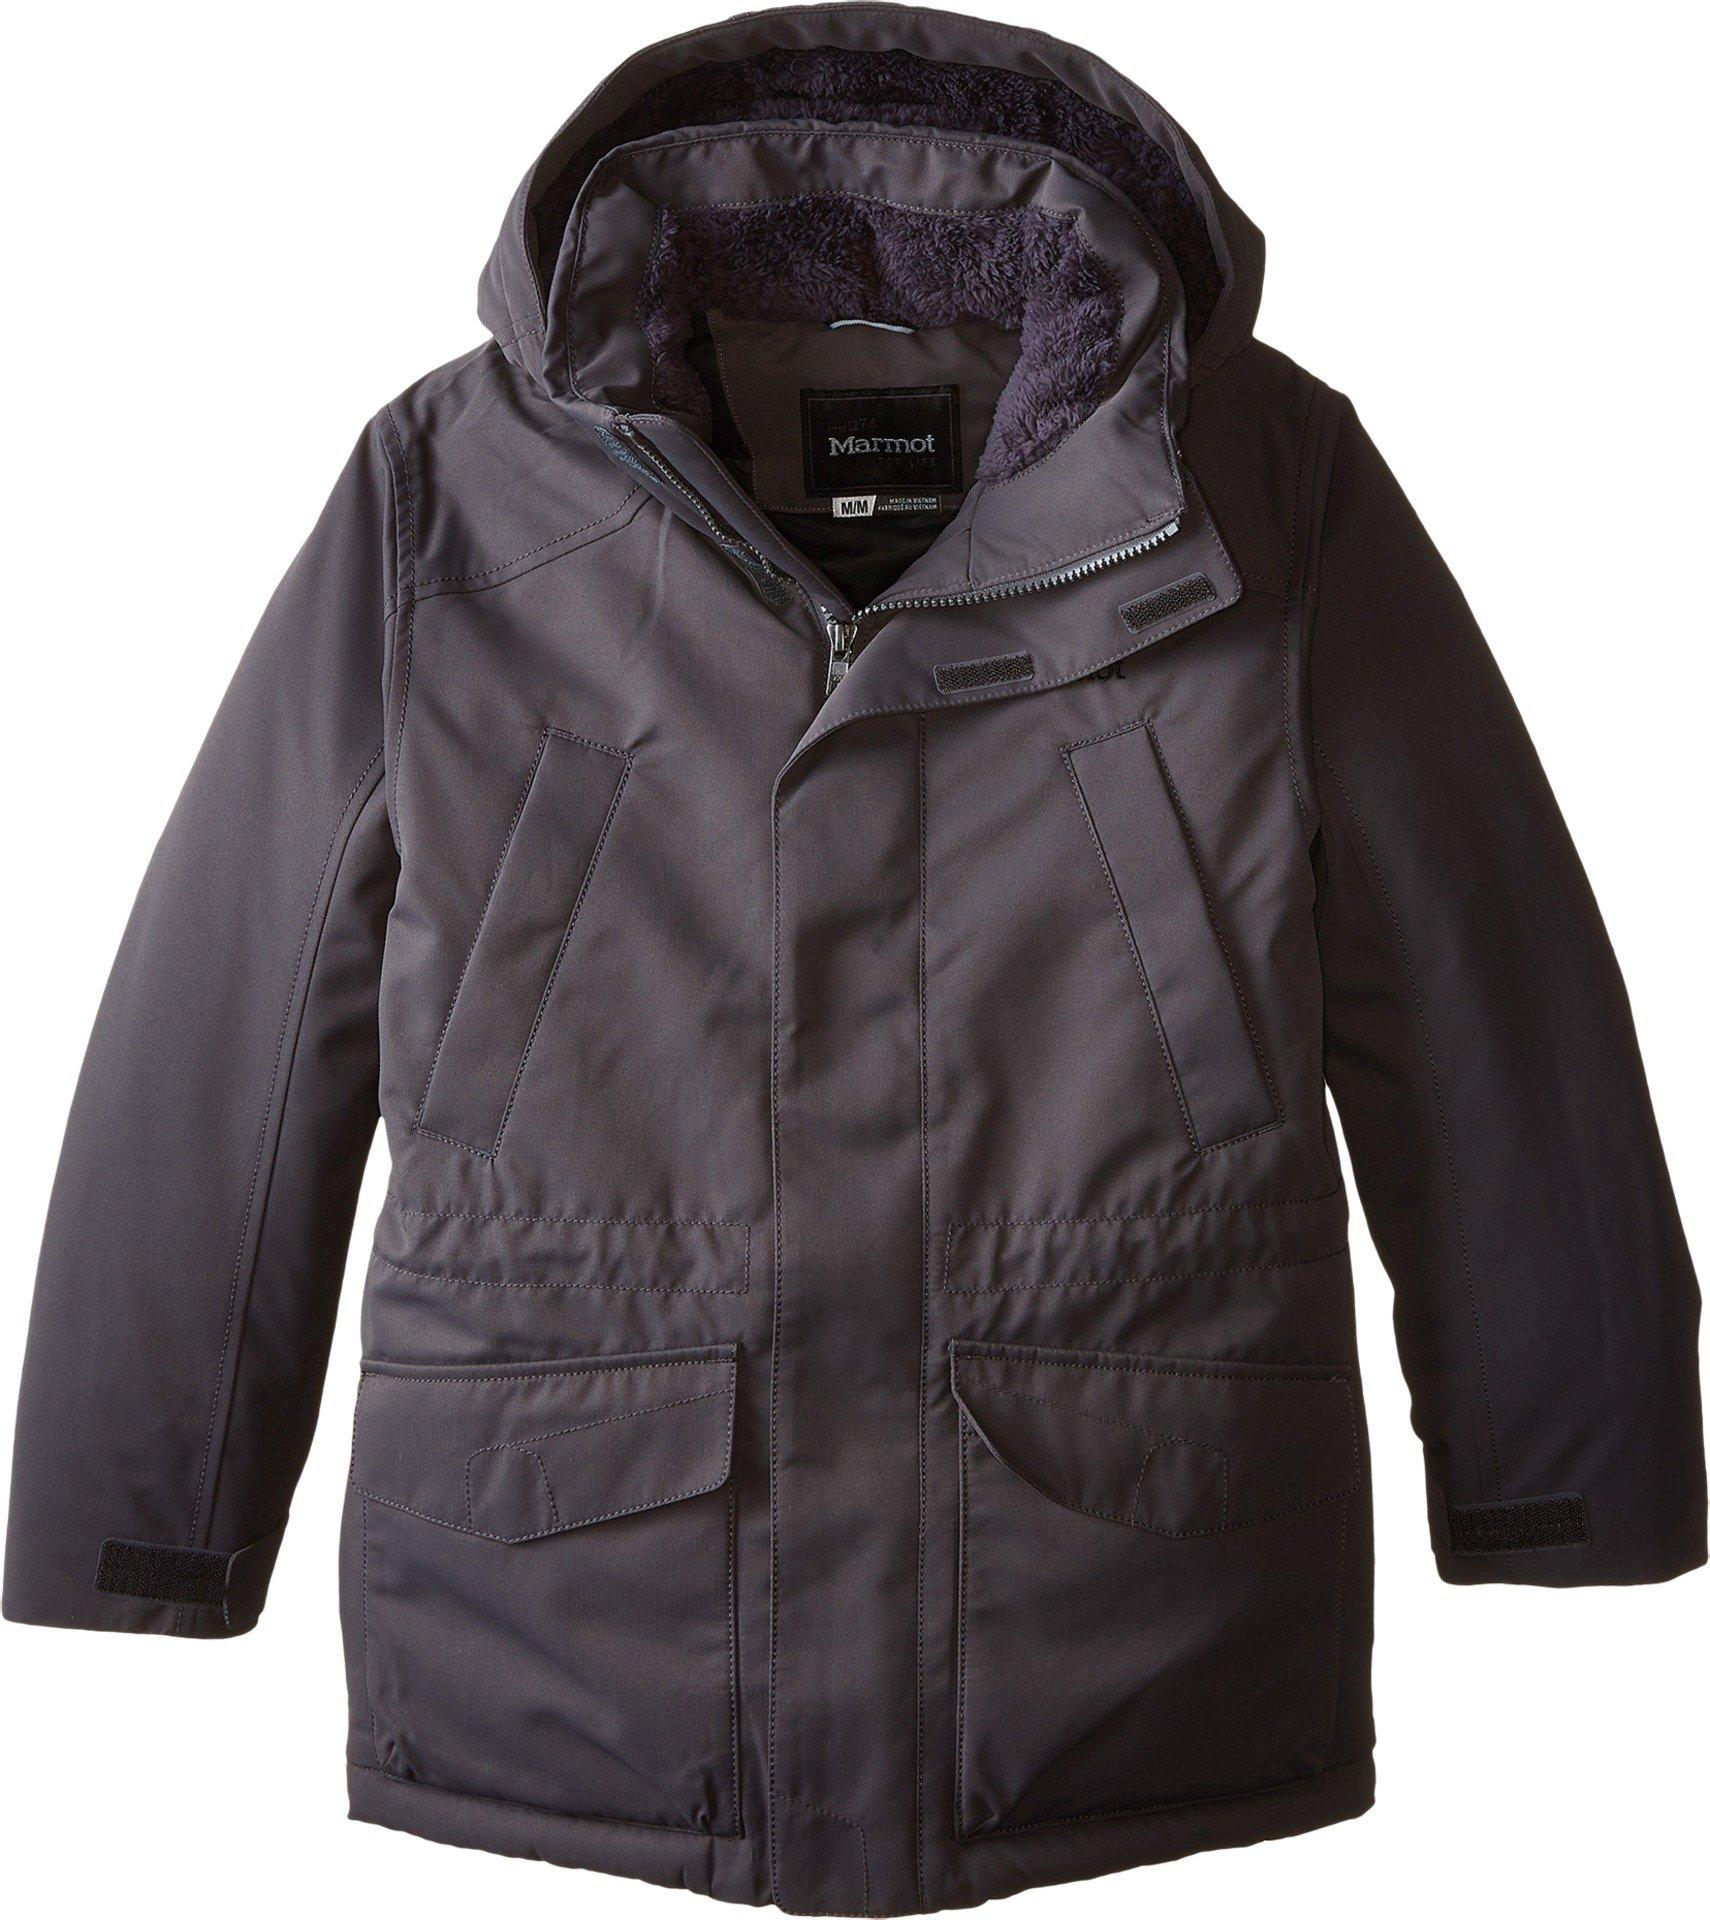 Marmot Kids Boy's Boy's Bridgeport Jacket (Little Kids/Big Kids) Slate Grey Medium by Marmot